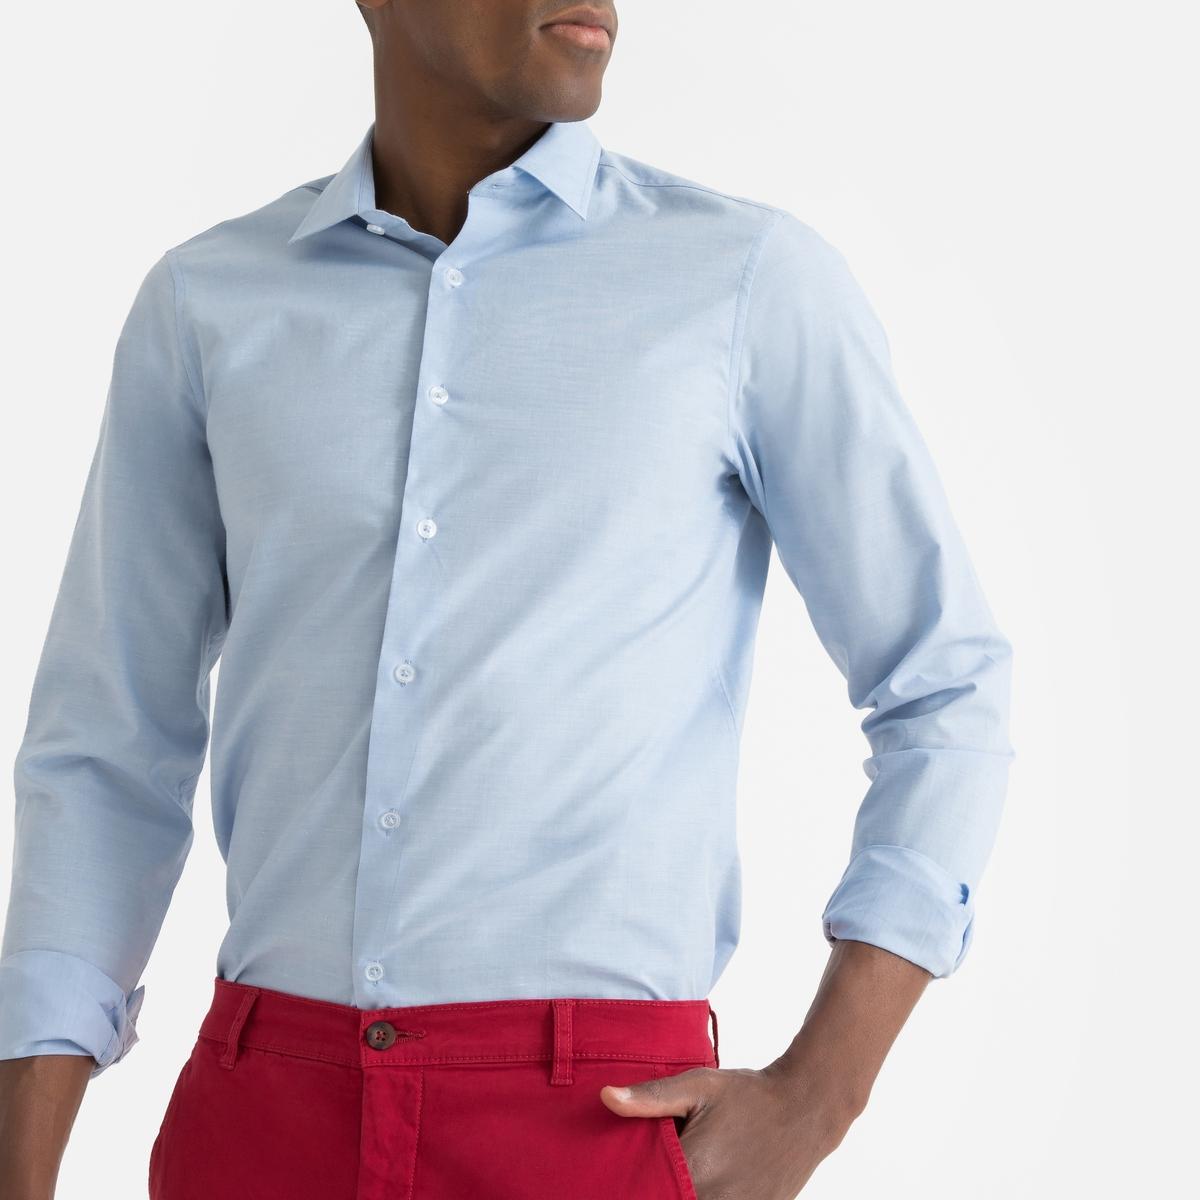 Camisa direita, mangas compridas